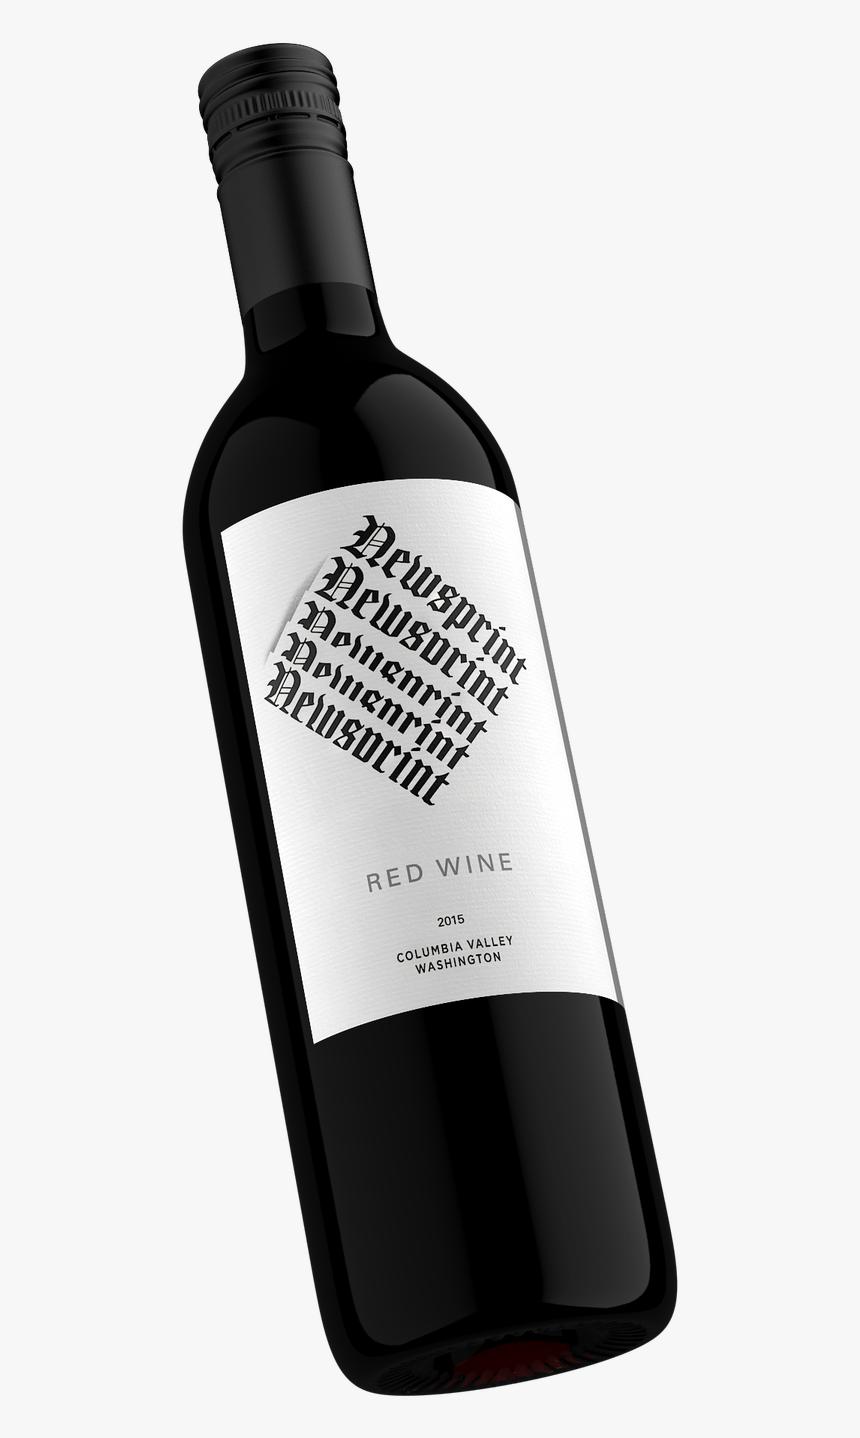 Wine - Singleimage - Wine Bottle, HD Png Download, Free Download